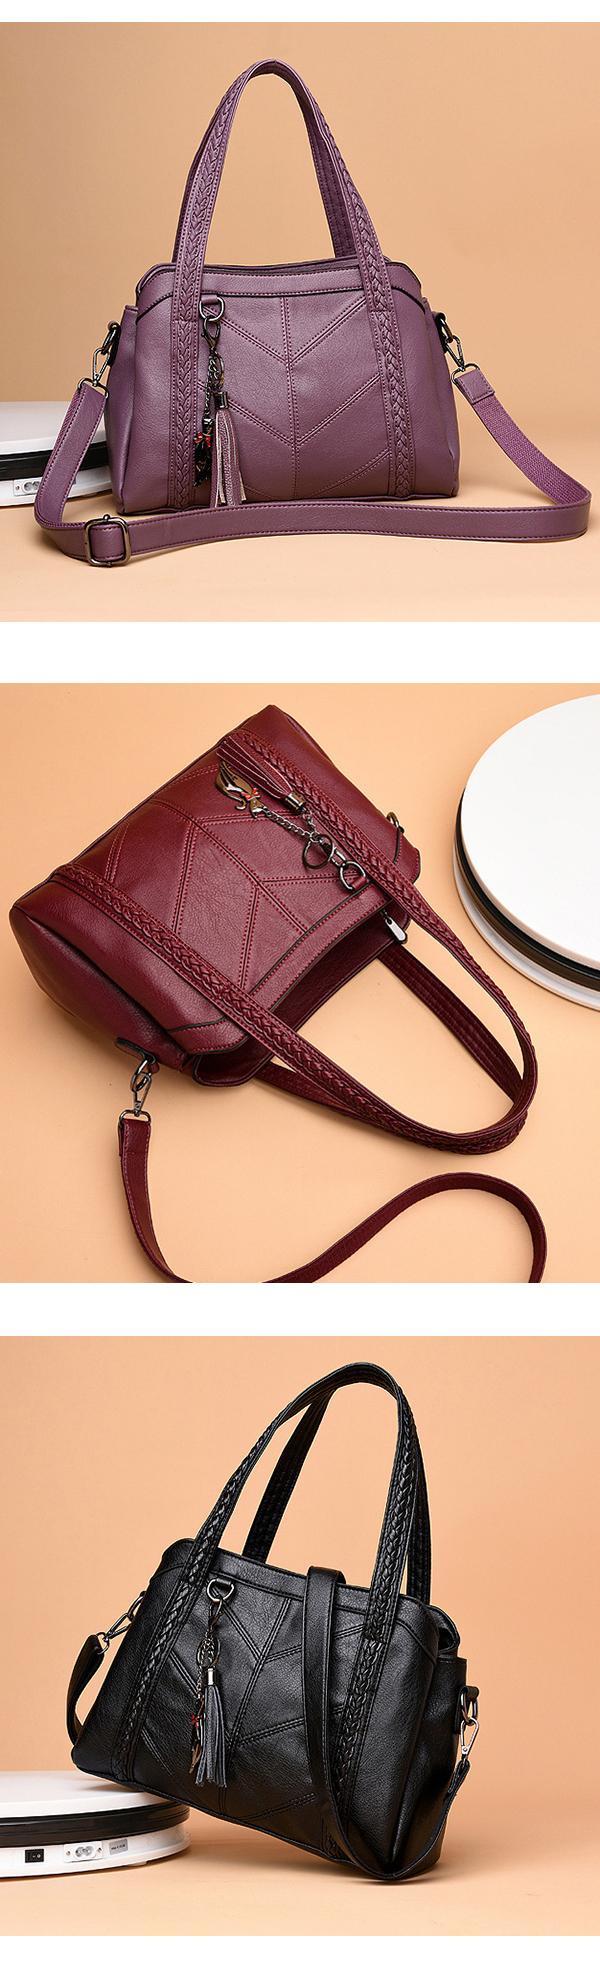 Women Elegant Soft PU Handbag Shoulder Bags Crossbody Bags